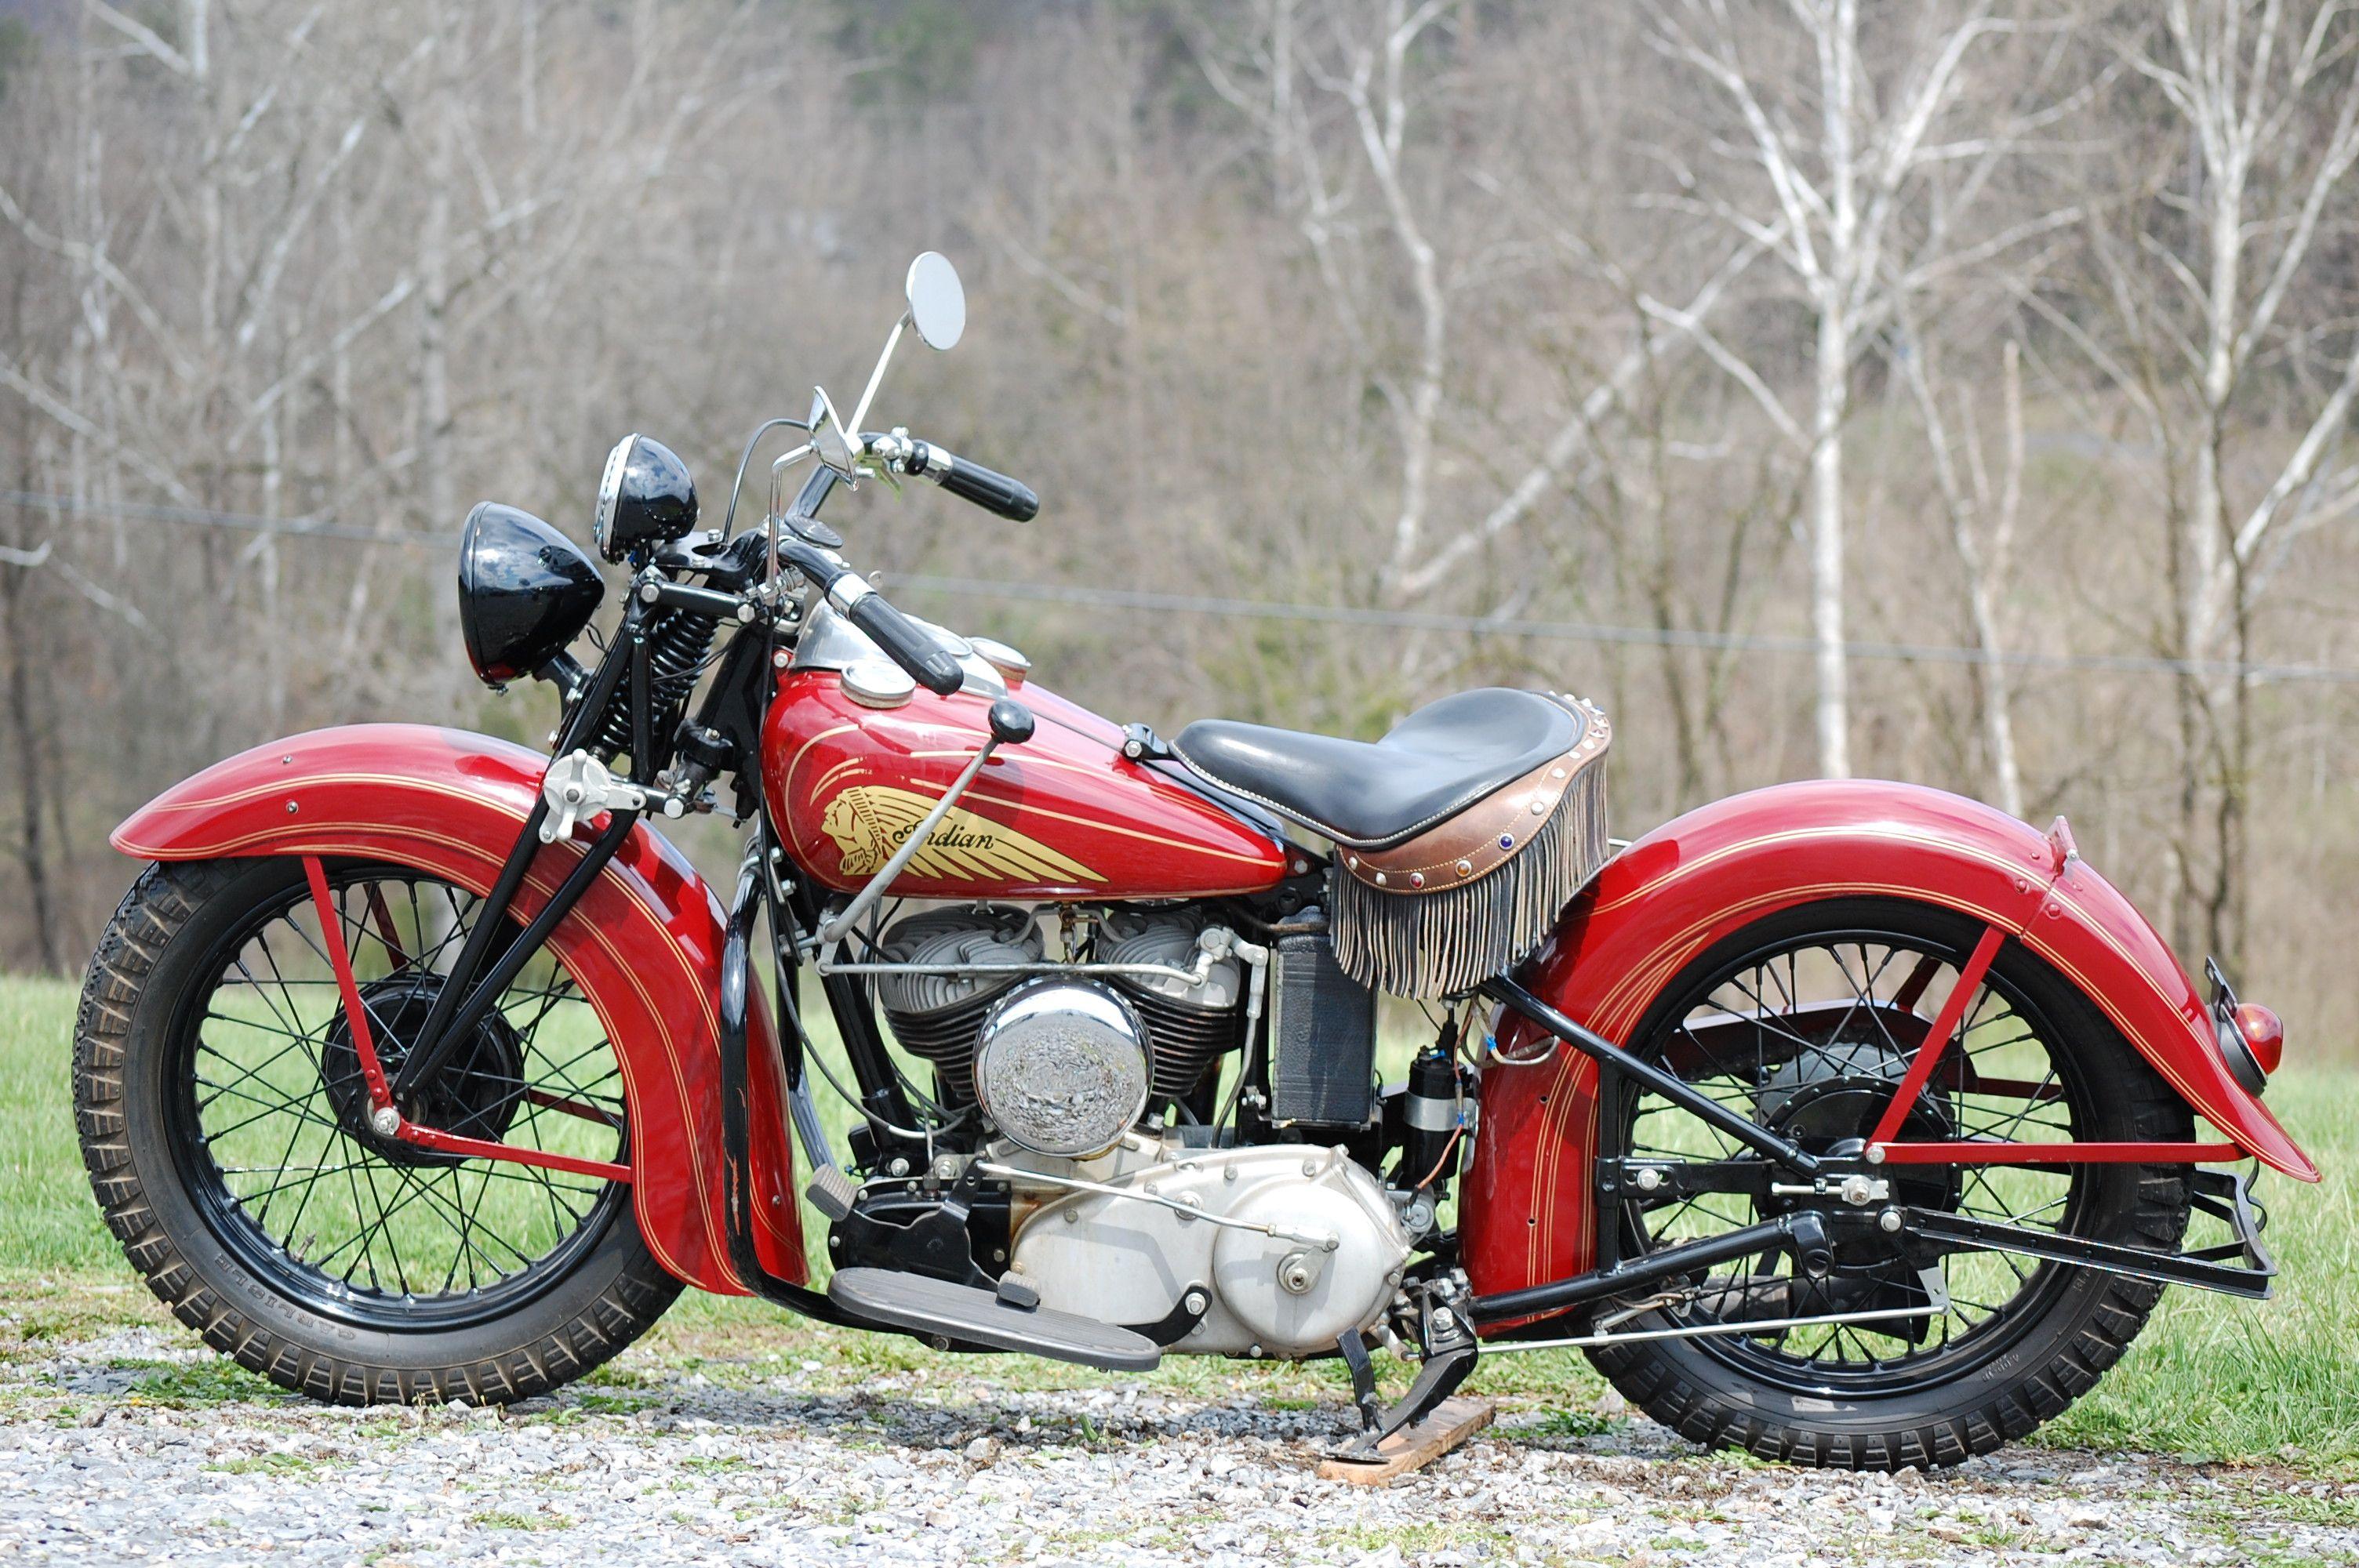 1939 indian motorcycle motorcycles 2 dreirad motorrad. Black Bedroom Furniture Sets. Home Design Ideas